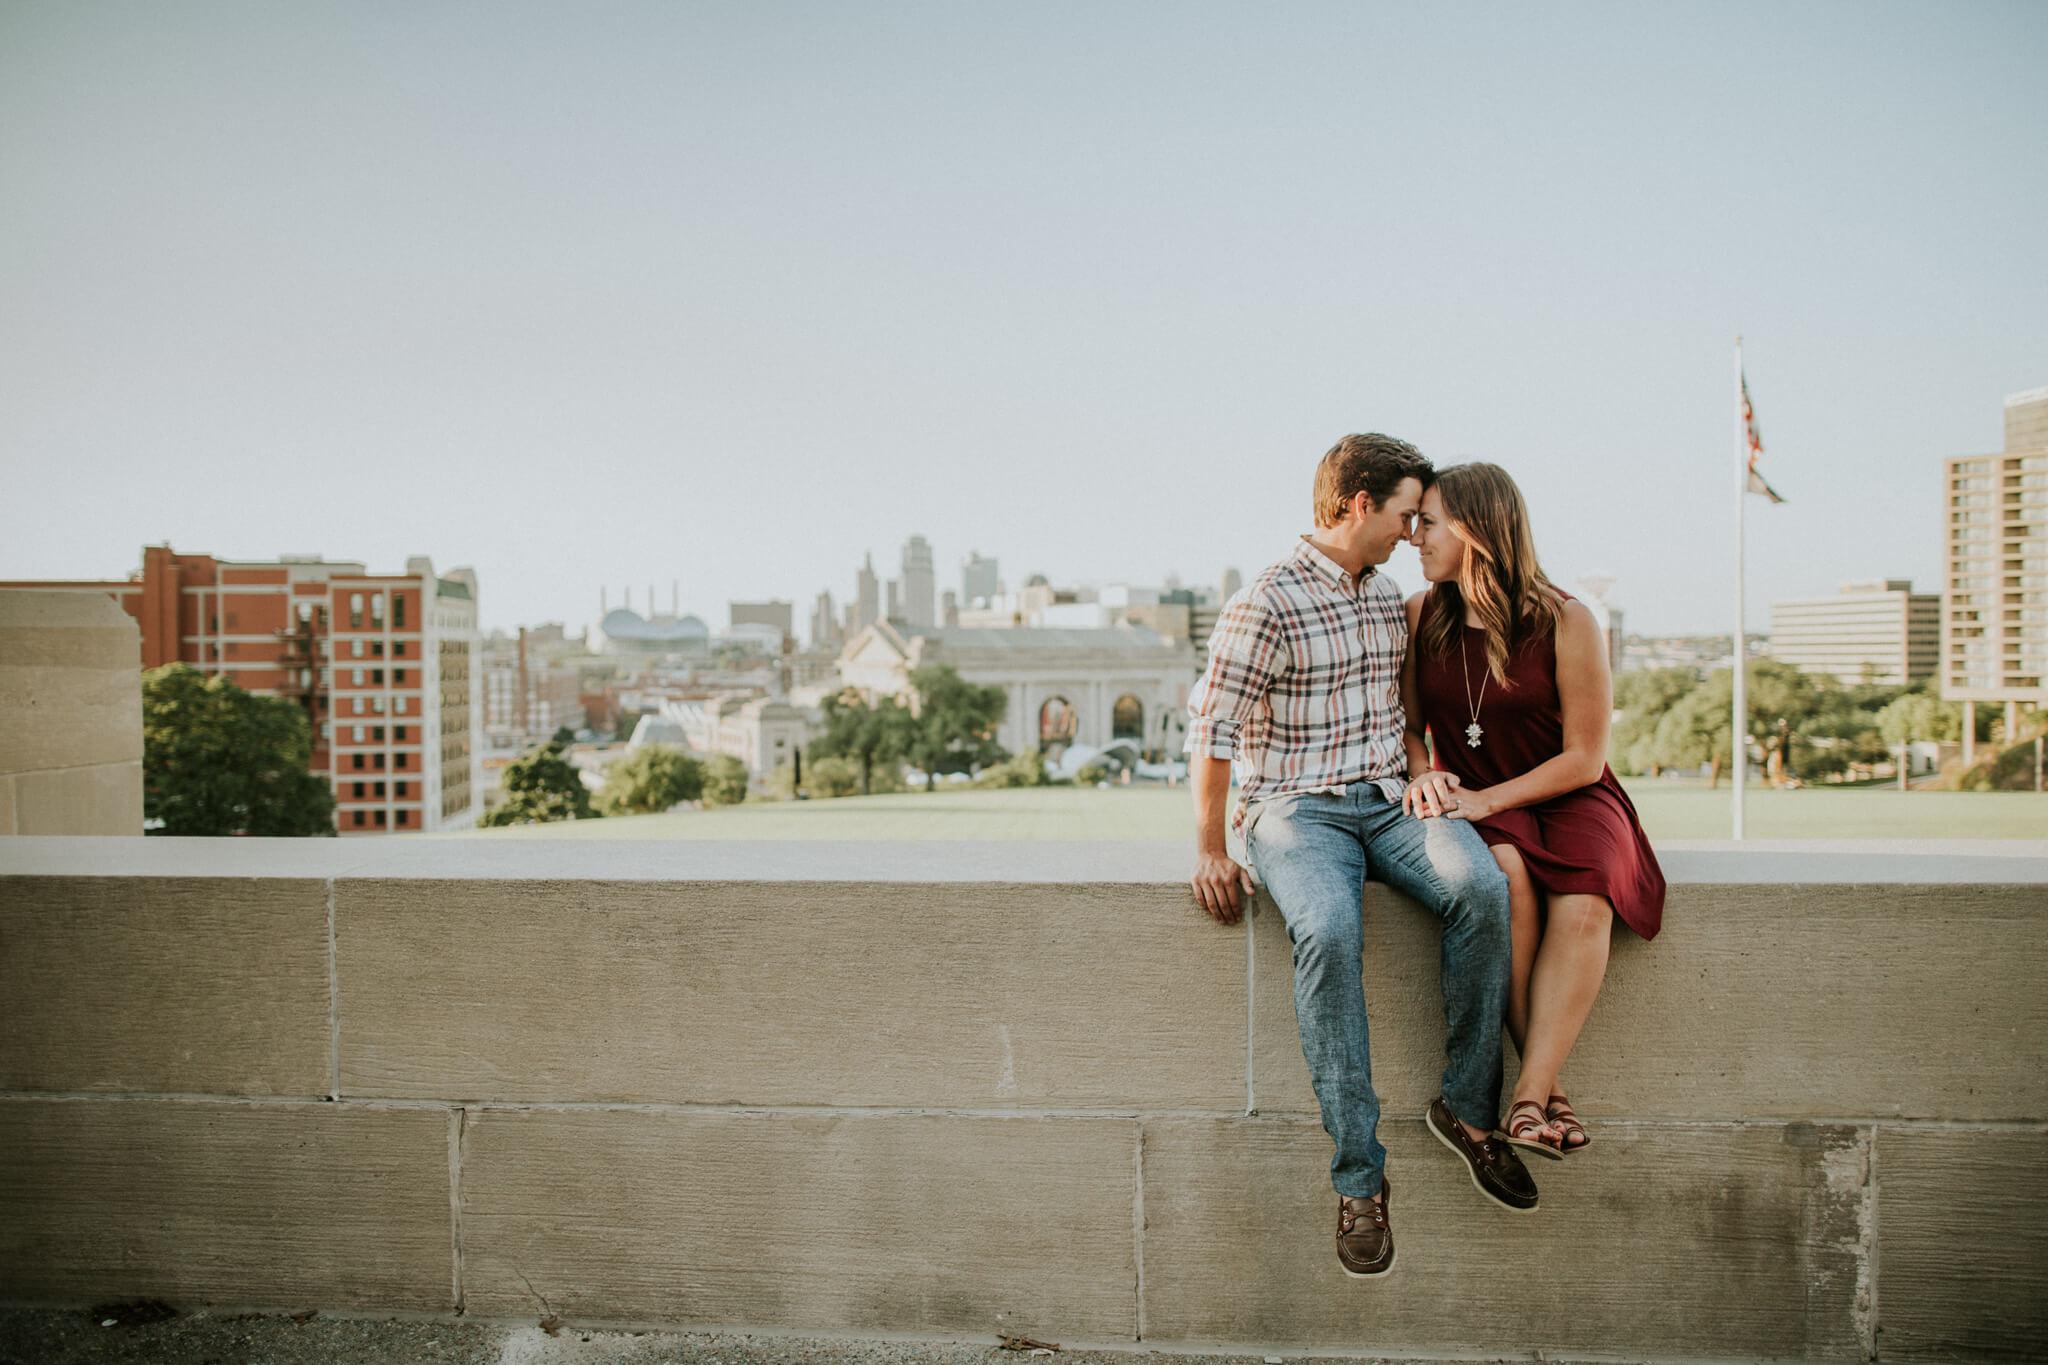 Match & flirt with singles in steele city